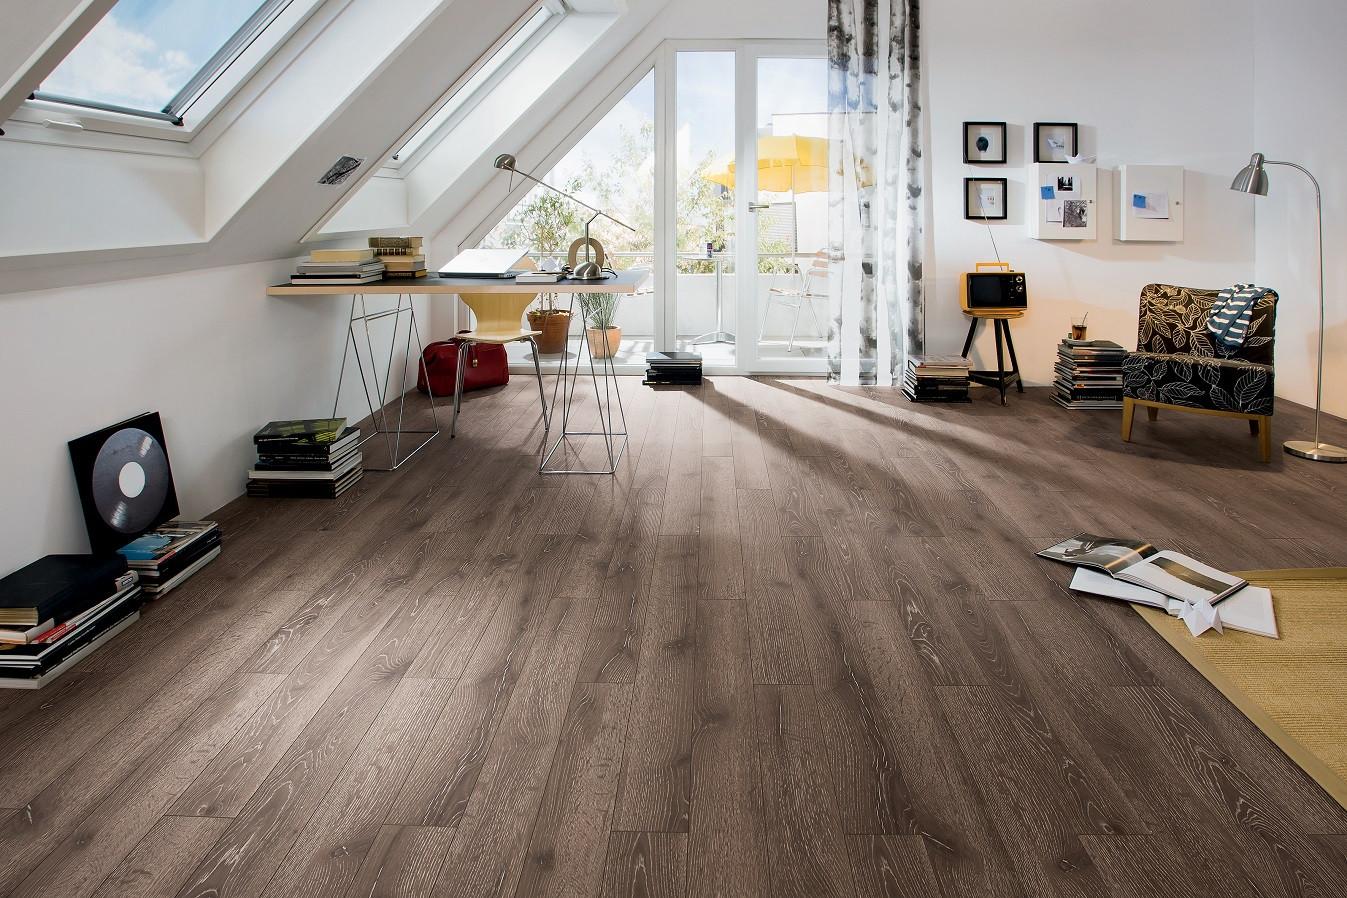 how to install quarter round on hardwood floors of ca laminate flooring california wood floor boards san jose los within ca best place to buy hardwood flooring